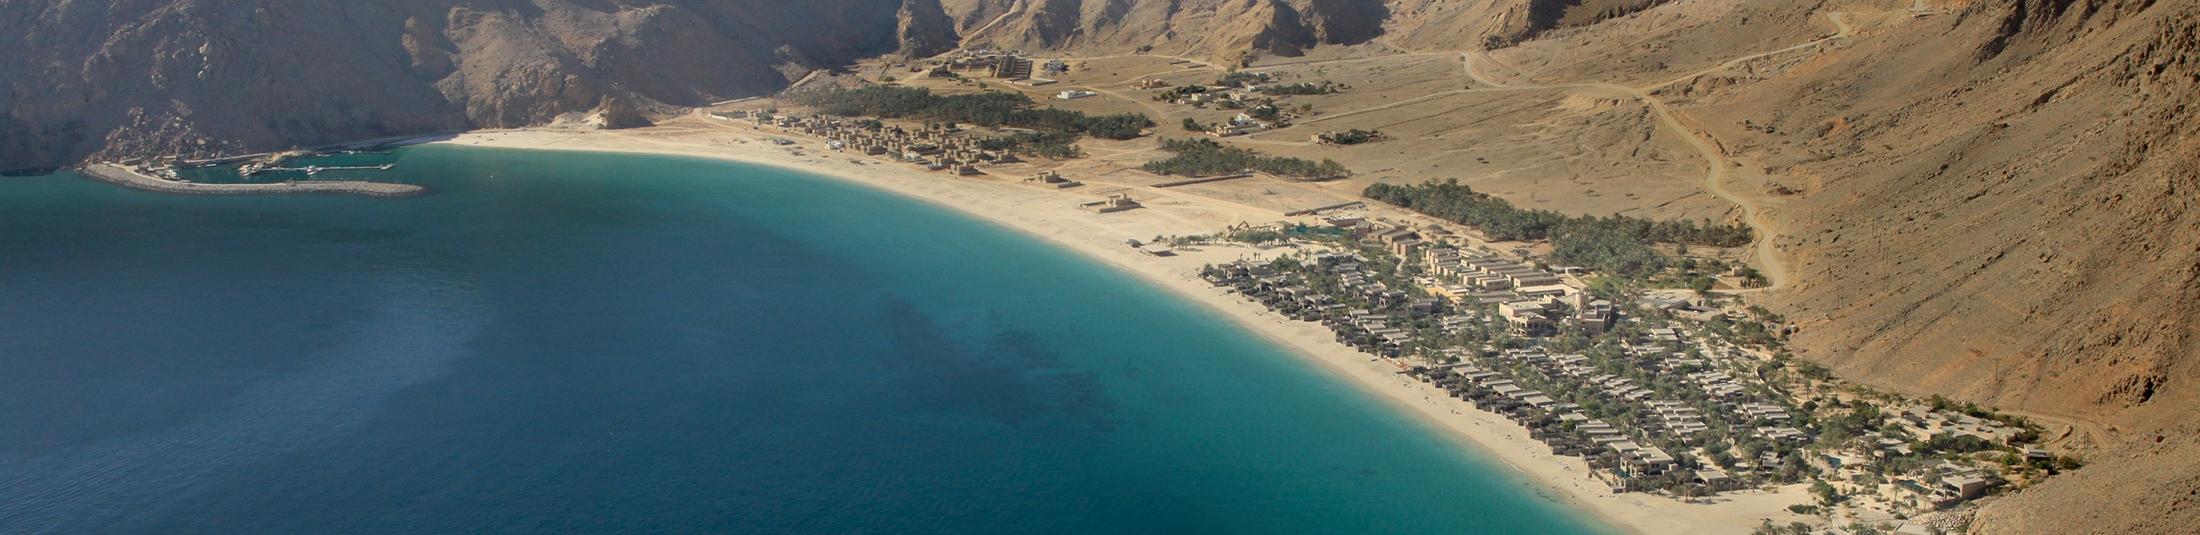 Six Senses Zighy Bay, Oman 01